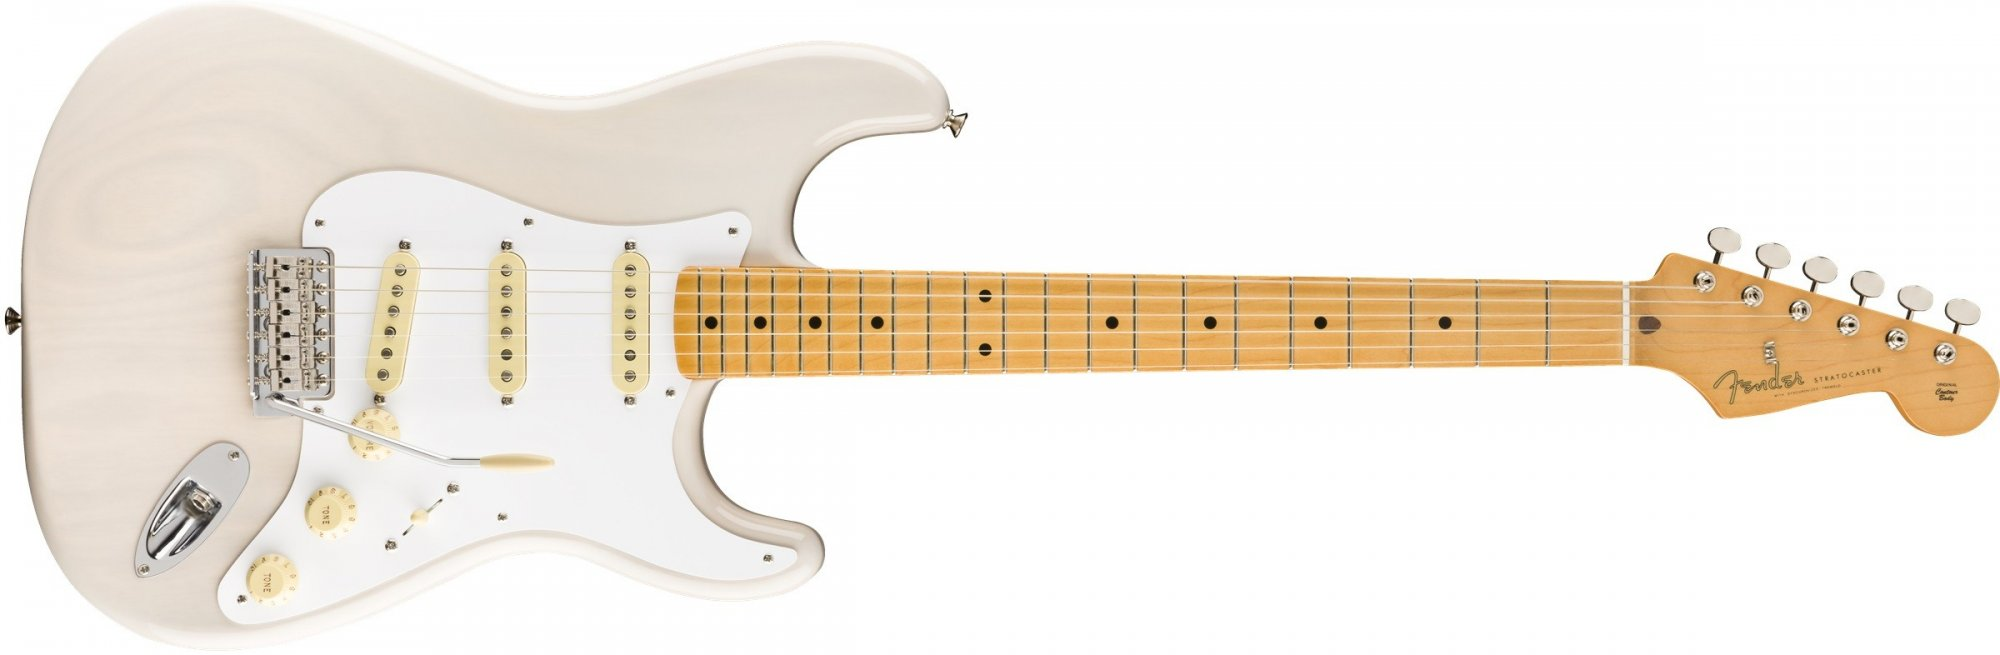 Fender Vintera 50's Stratocaster White Blonde Maple